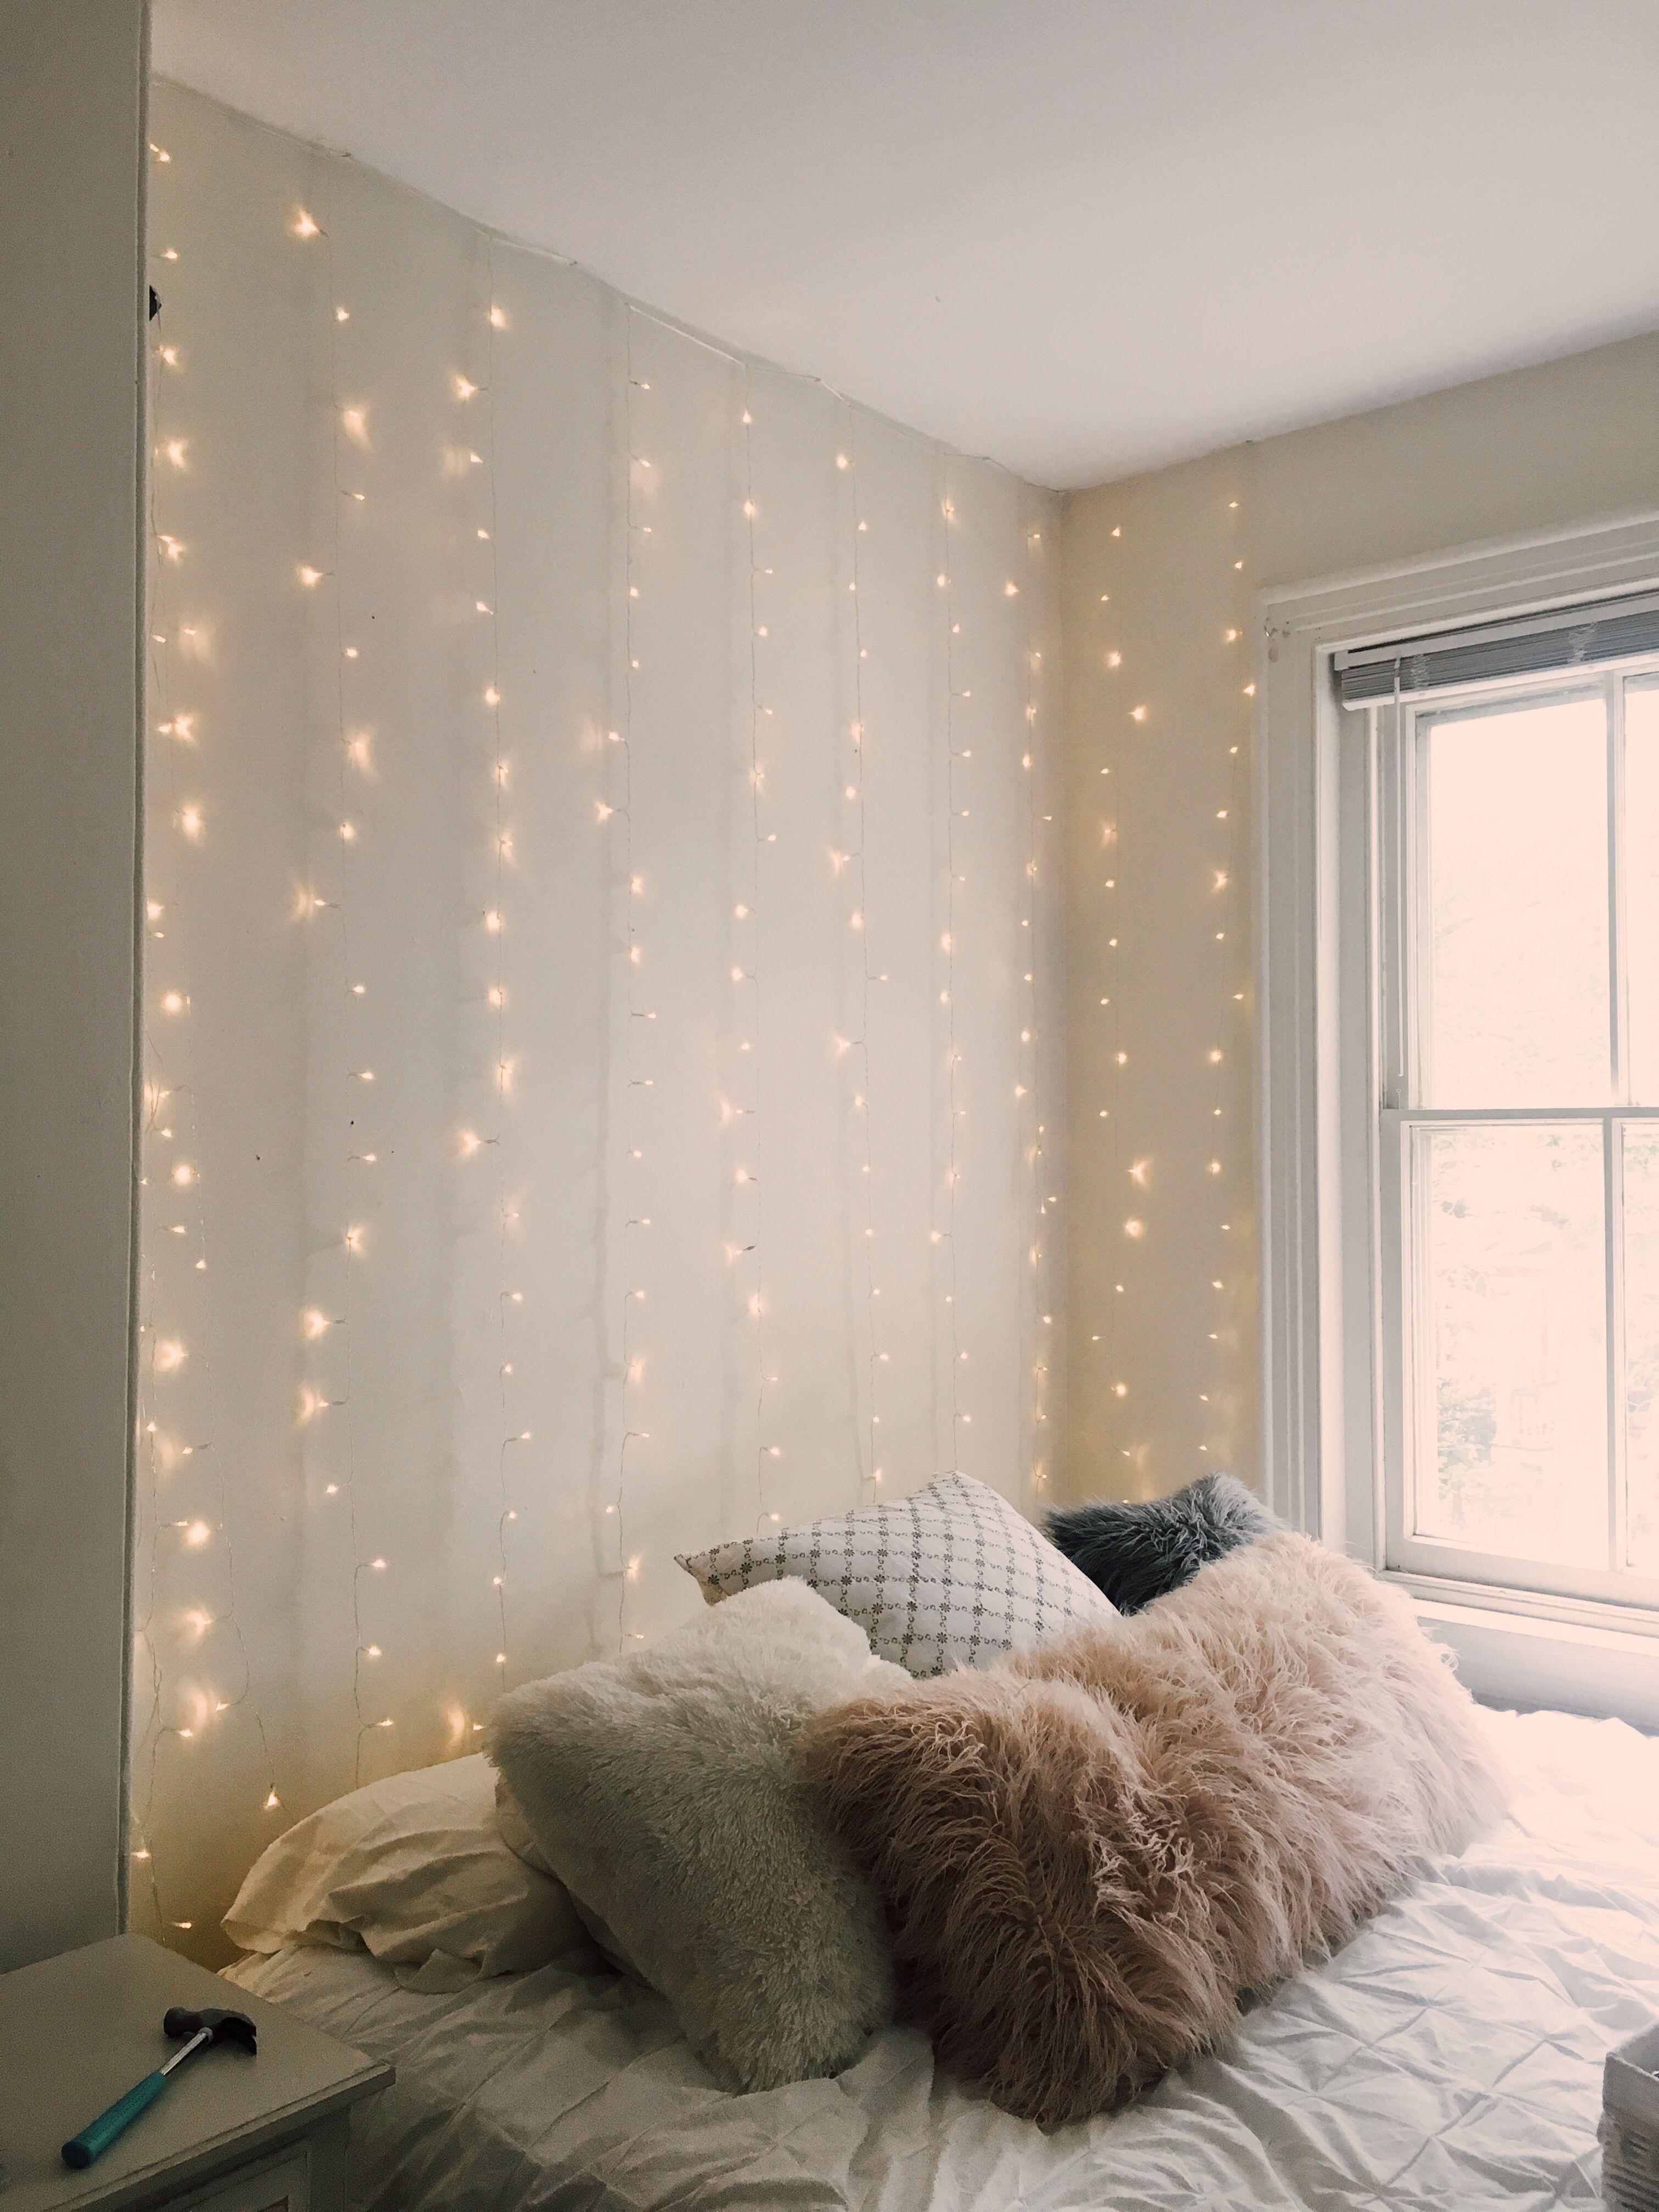 Instagram Nicolekavetski Teenroomdecor Mit Bildern Zimmer